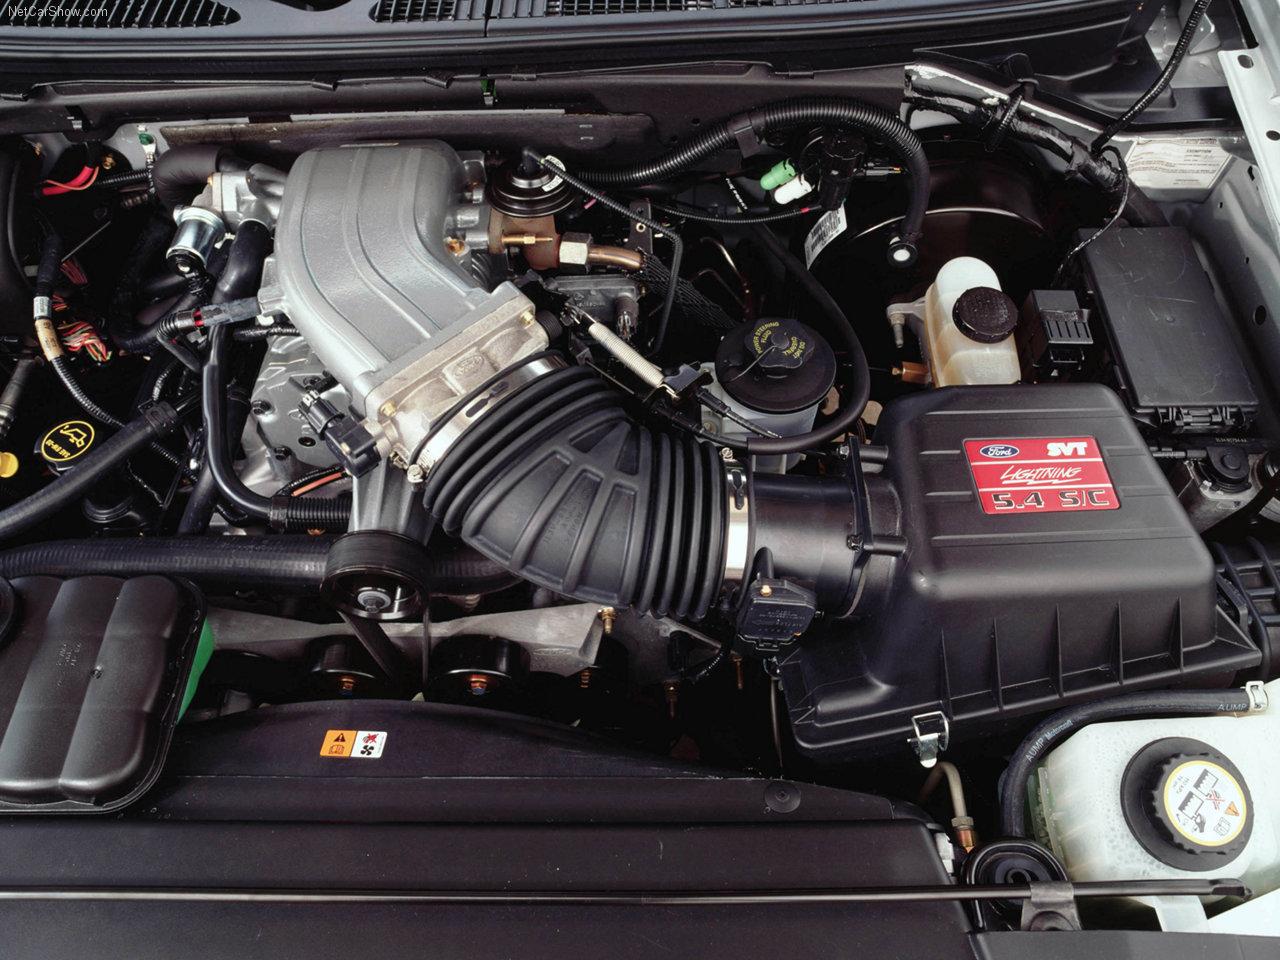 ... - Populaire français d'automobiles: 2004 Ford F-150 SVT Lightning